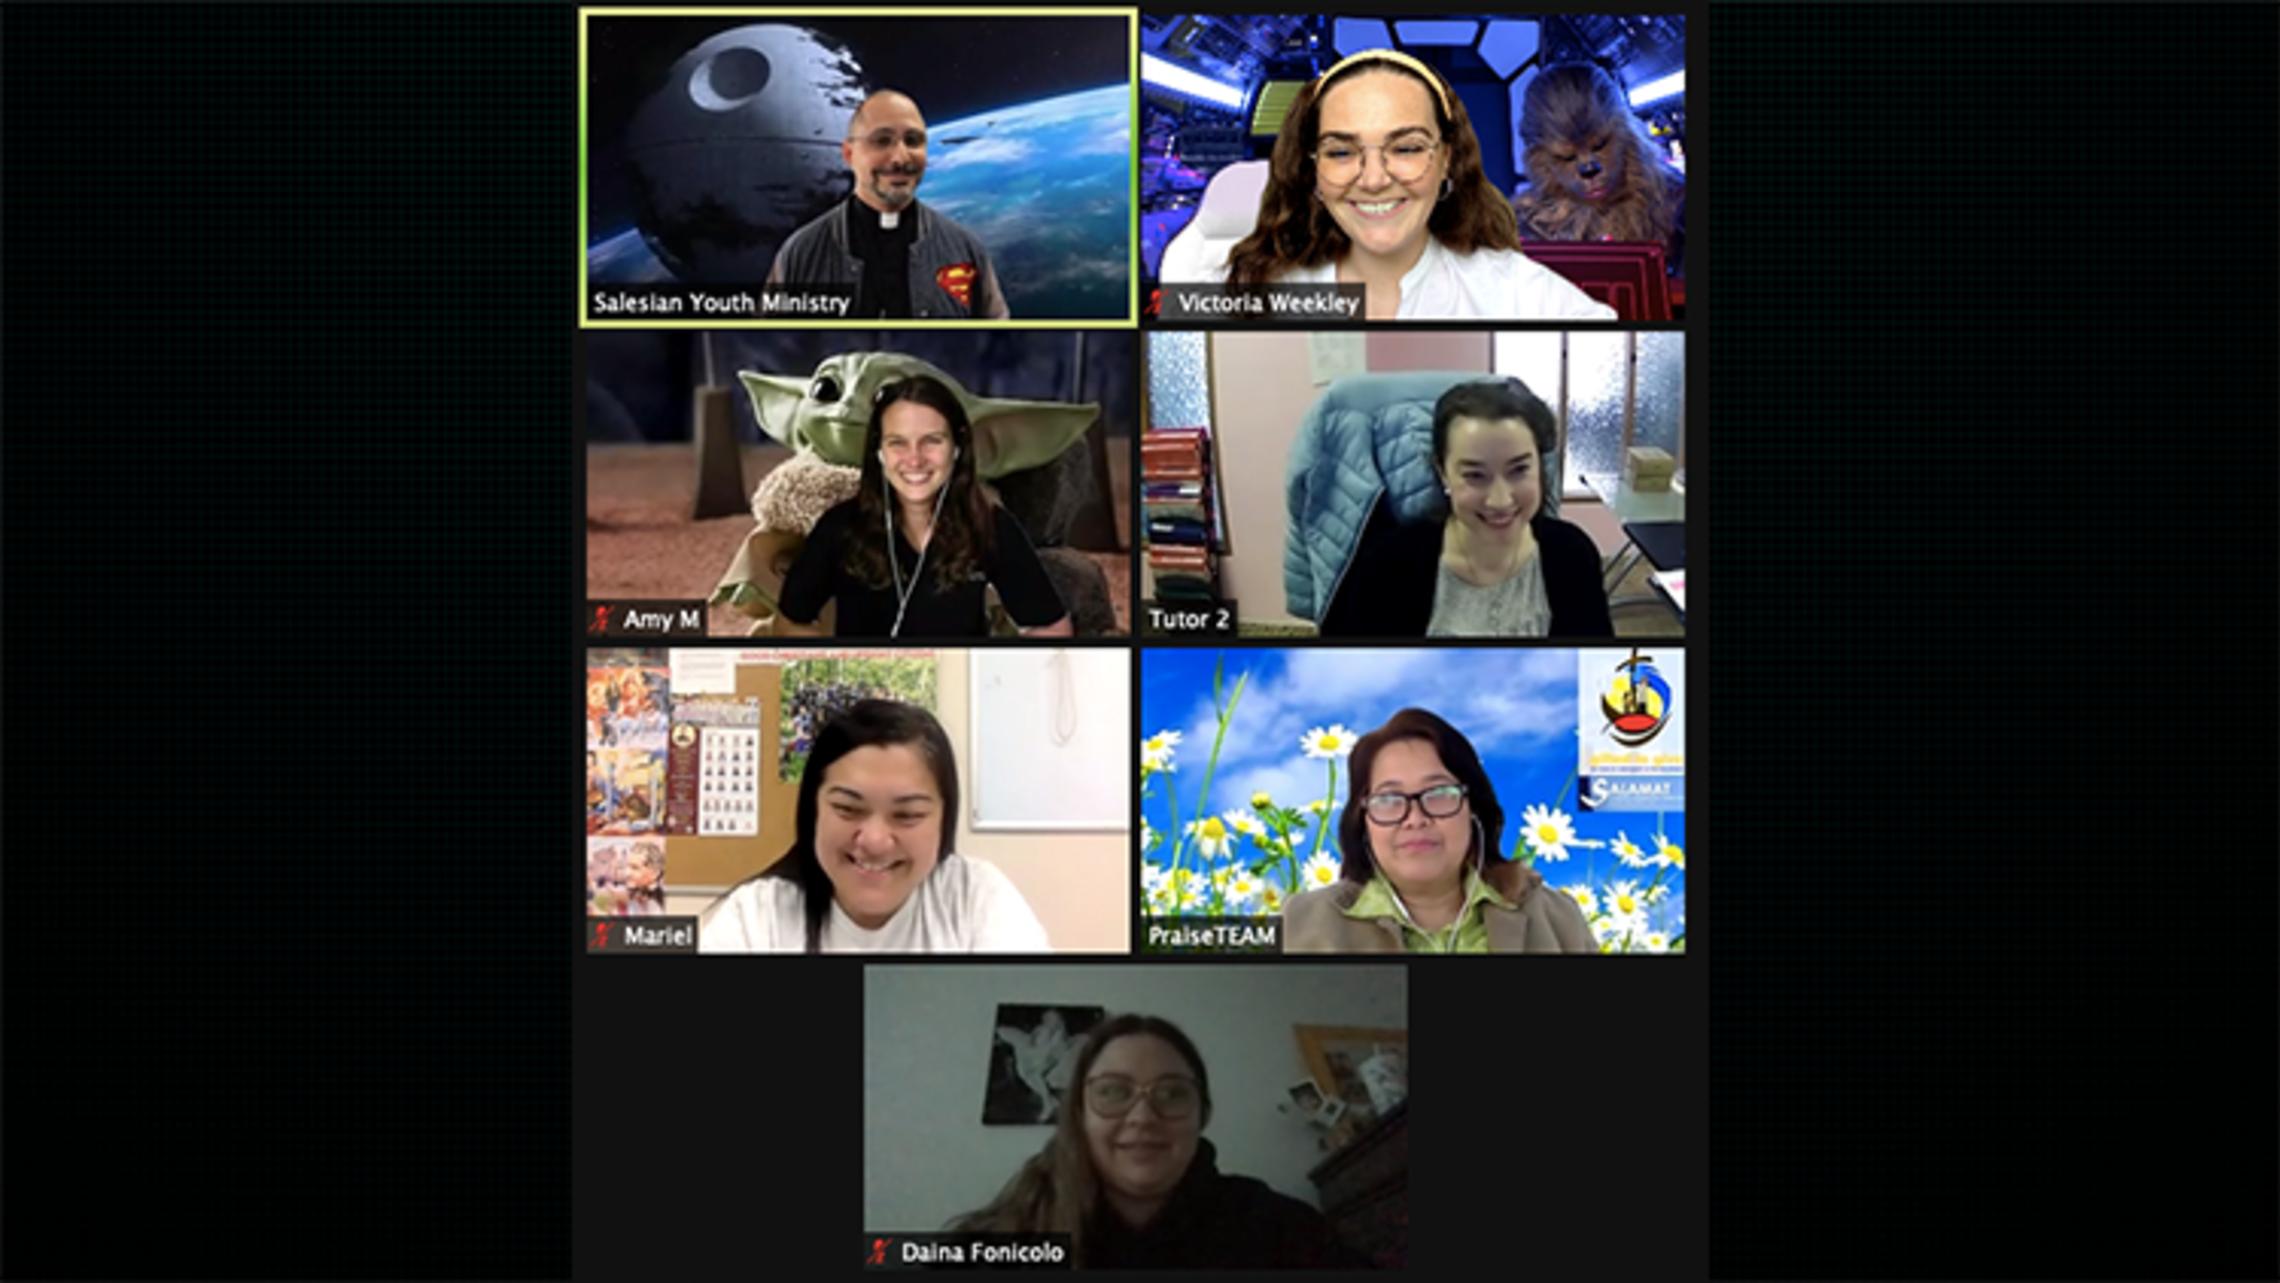 Beth's CYM Meetings Reflection